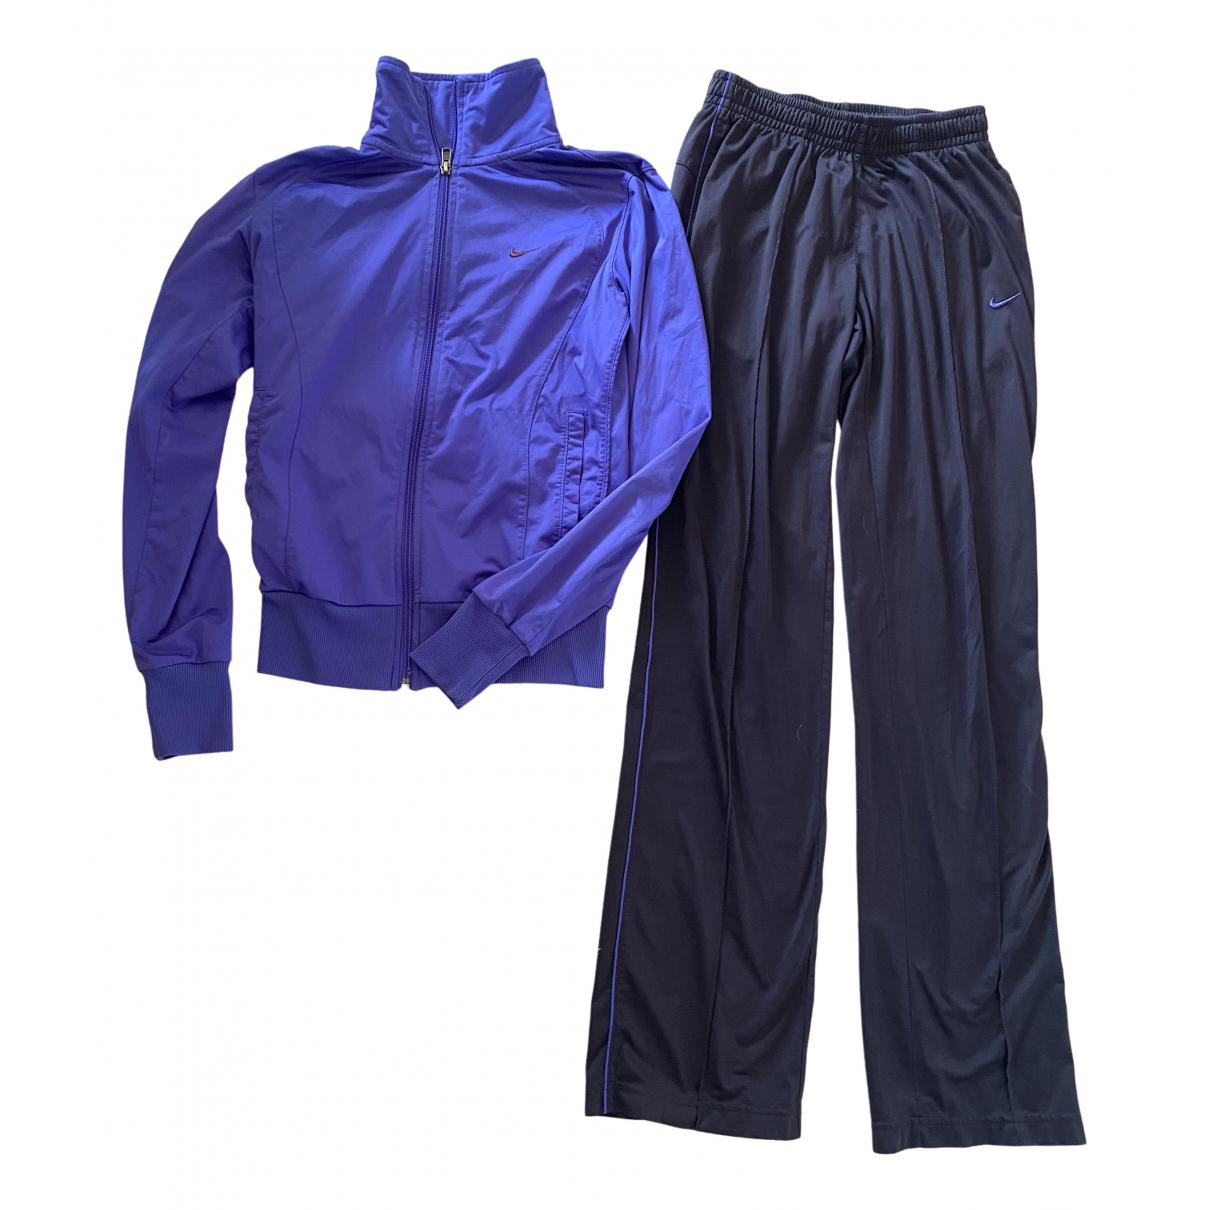 Nike \N Black Trousers for Women XS International